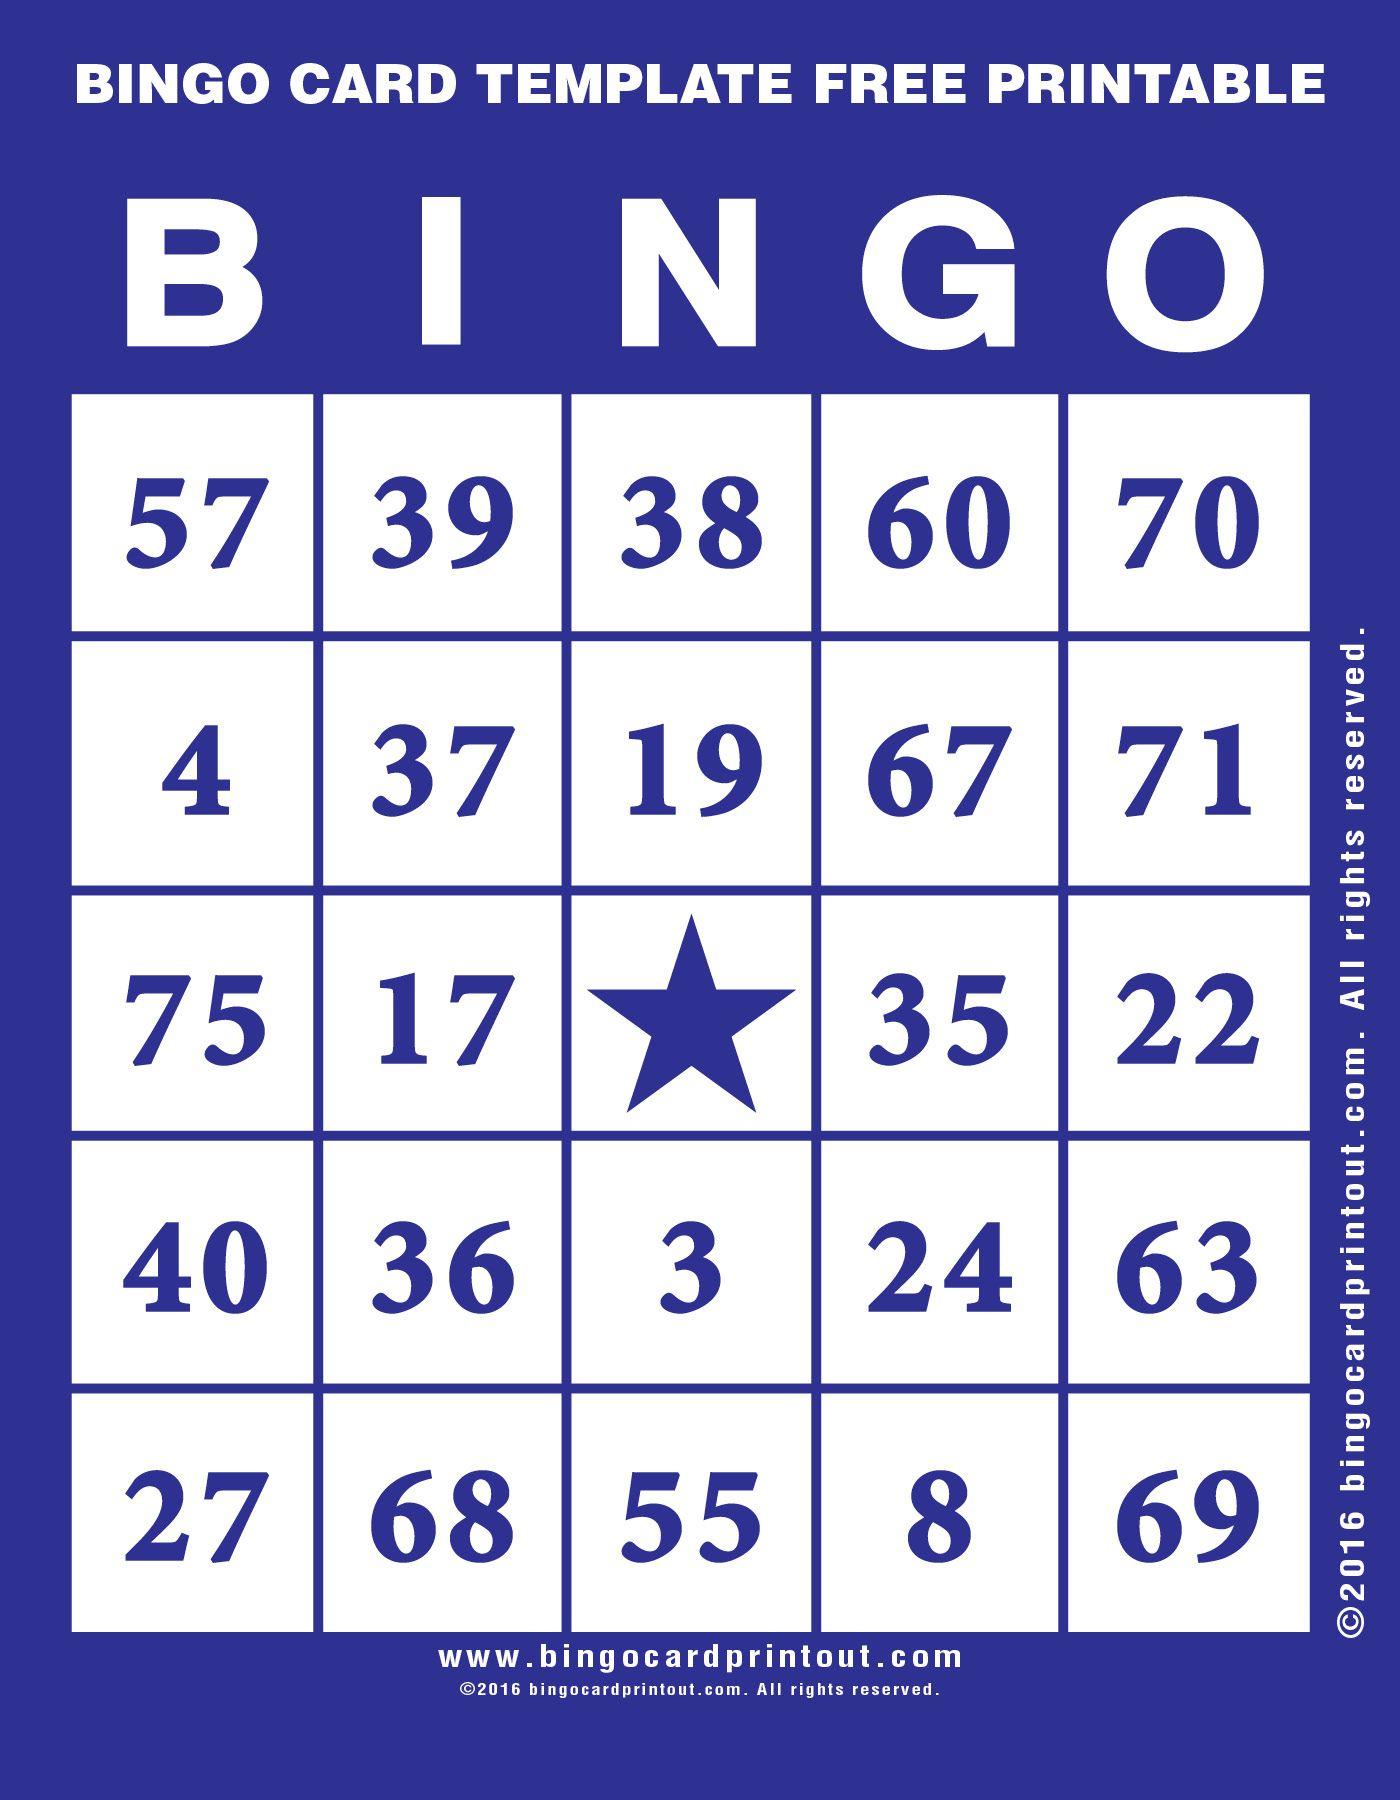 Bingo Card Template Free Printable 6 | Bingo Cards Printable